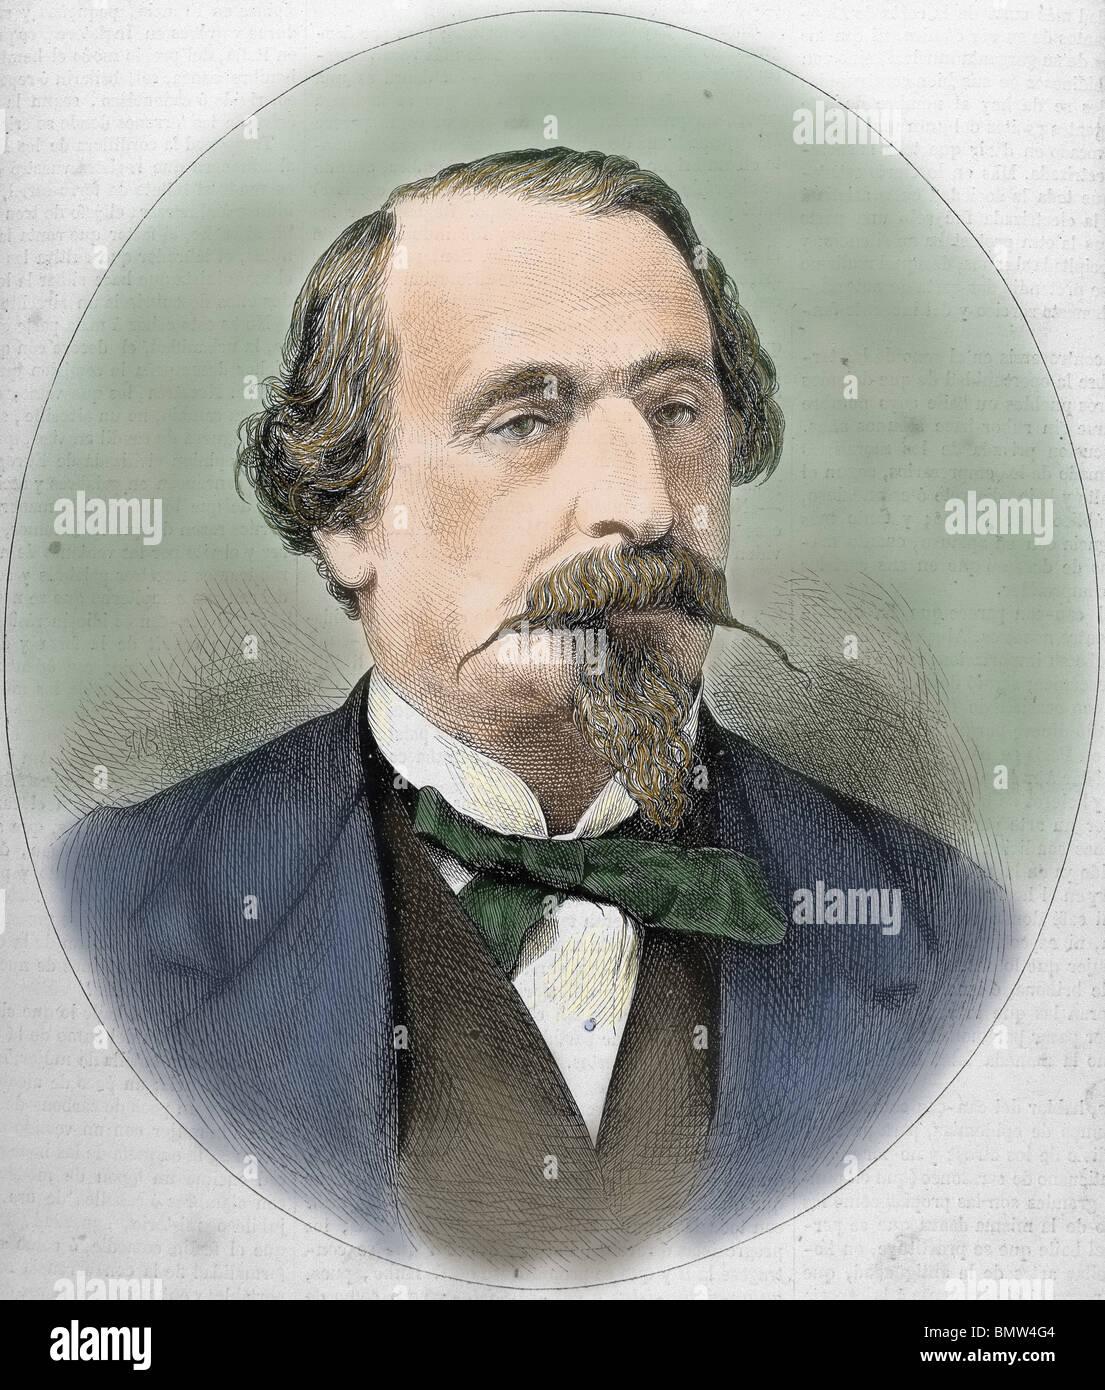 https www alamy com stock photo napoleon iii paris 1808 chislehurst 1873 french emperor 1852 1870 30055876 html